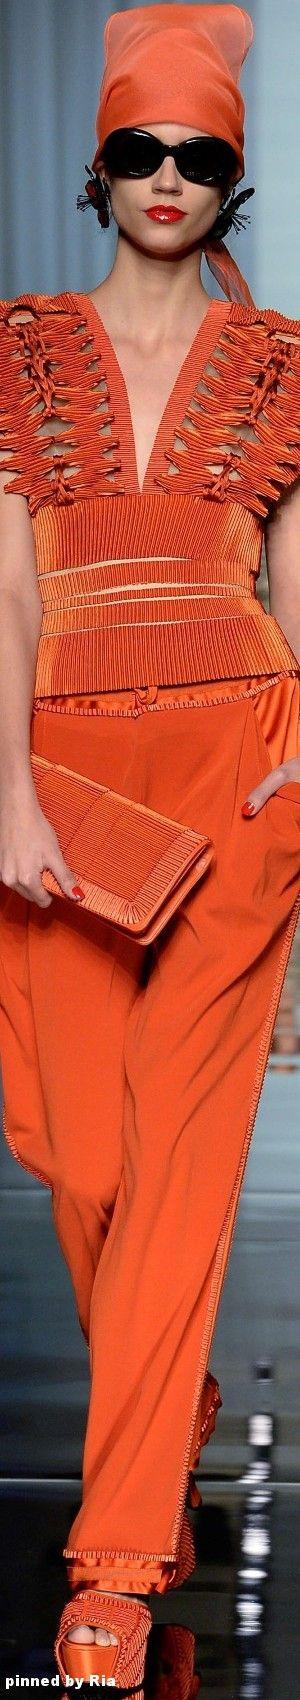 Jean Paul Gautier Spring 2017 Couture l Ria